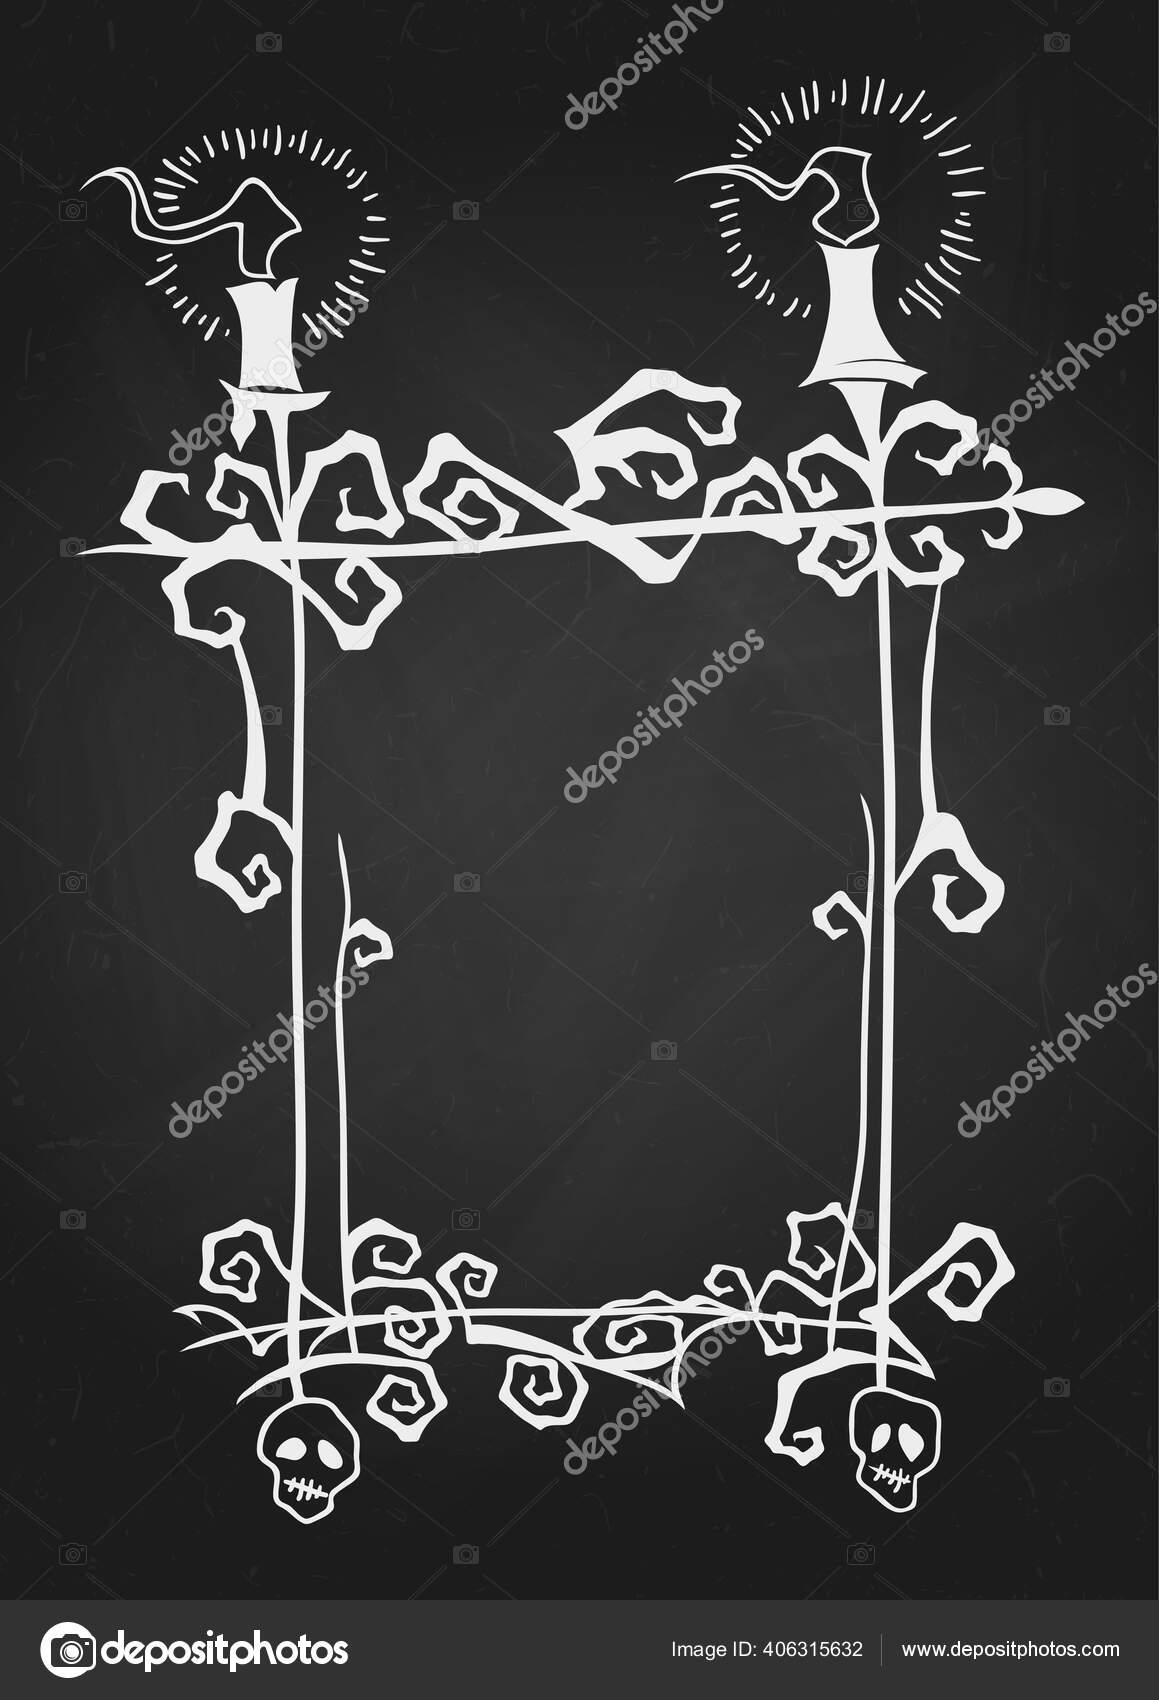 Ornate Blank Frame Glowing Candles Hand Drawn Halloween Celebration Design Stock Vector C De Kay 406315632